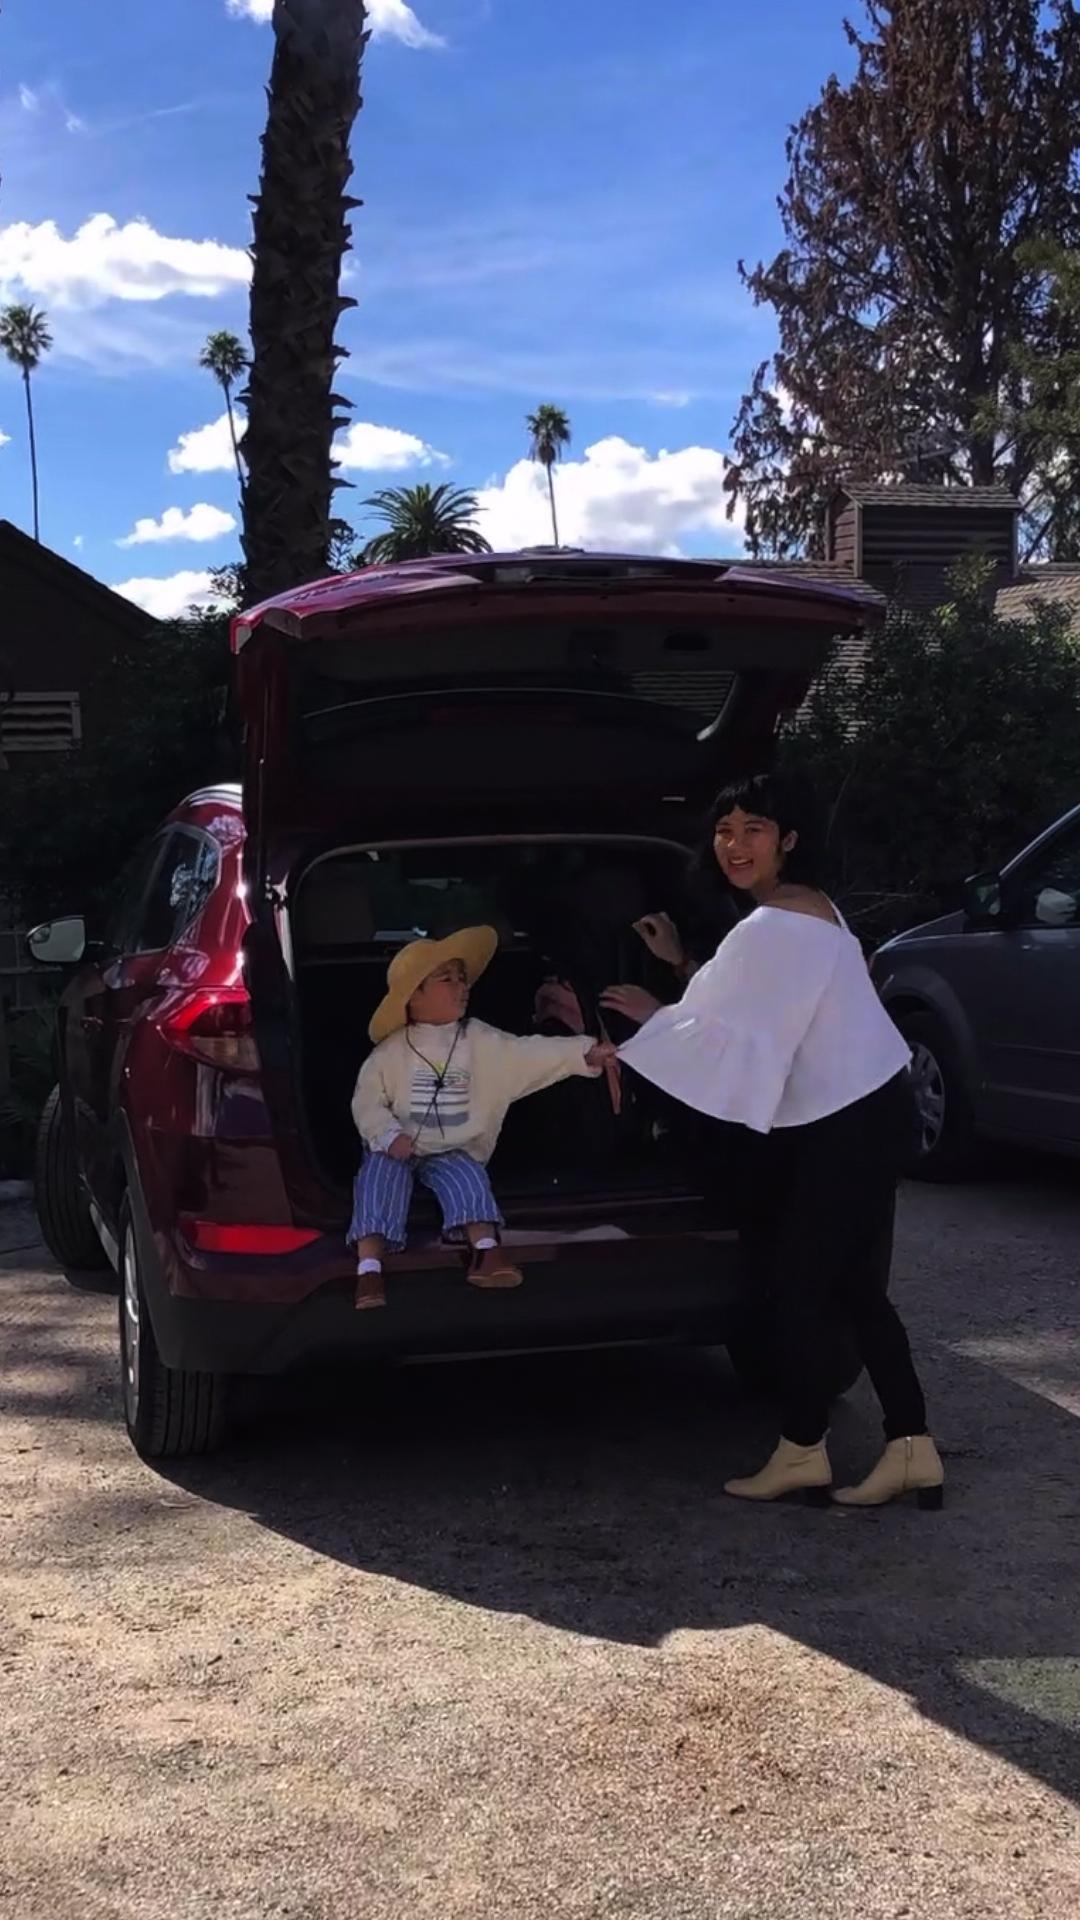 Melissa places the folded-up Peli stroller in the back of her car, with help from her little one, Harrison.  #joowaadreaming #designforchildren #letthembelittle #littleandbrave #livecolorfully #thatsdarling #babylove #babygoods #childhoodunplugged #bringthekids #oureverydaymoments #candidchildhood #littleandbrave #writeyouonmyheart #illuminatechildhood  #livethelittlethings  #lifeofadventure  #bringthekids #writeyouonmyheart #inbeautyandchaos #babyproducts #babyshower #babyshop #mynameismama